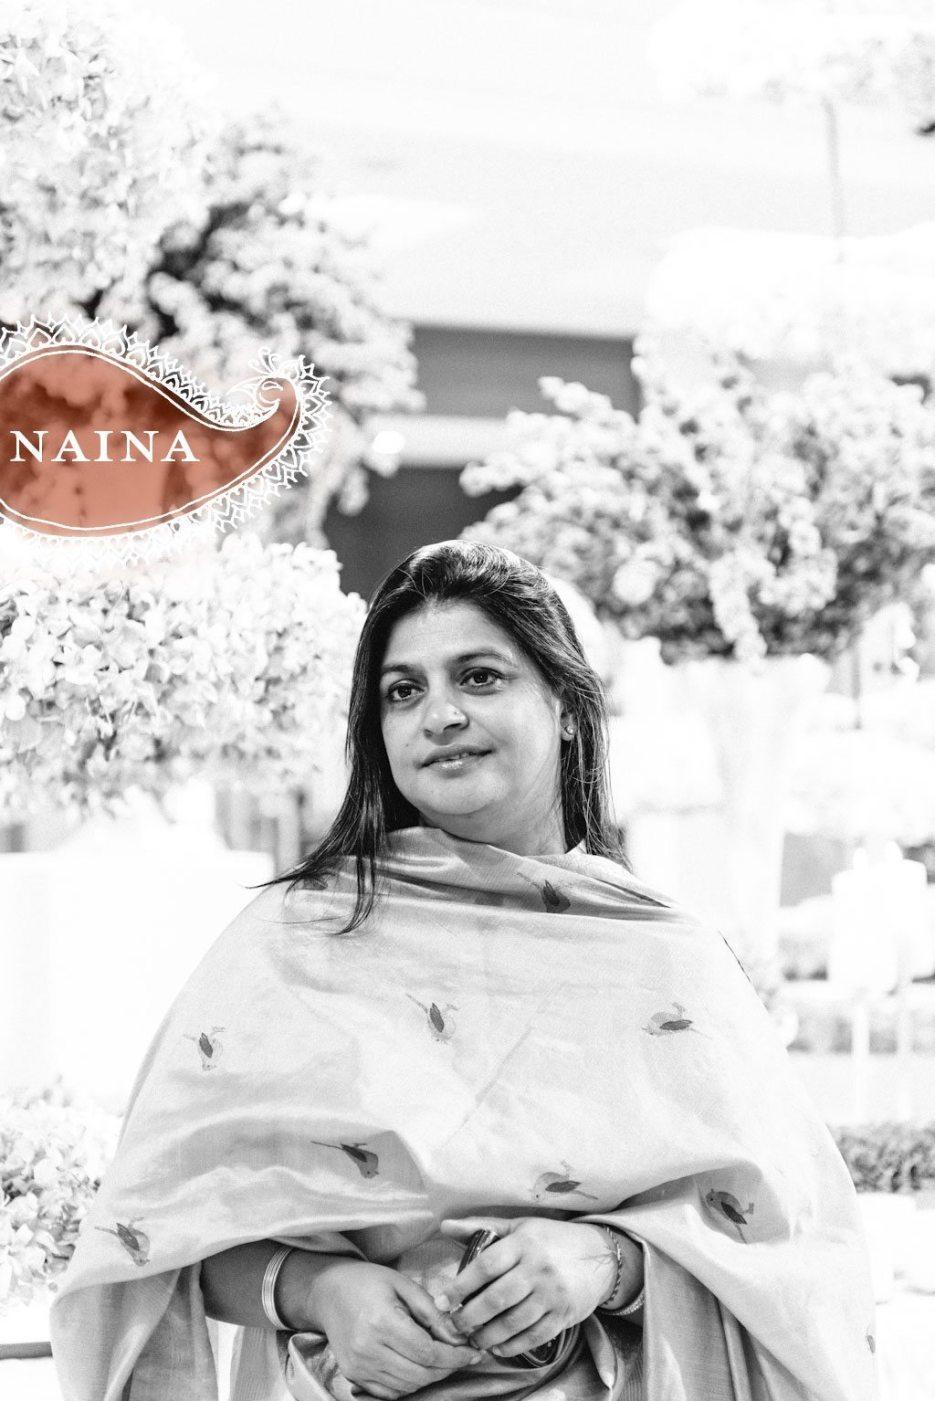 Naina-Knottytales-Professional-Photographer-Wedding-Atelier-2012-44.jpg